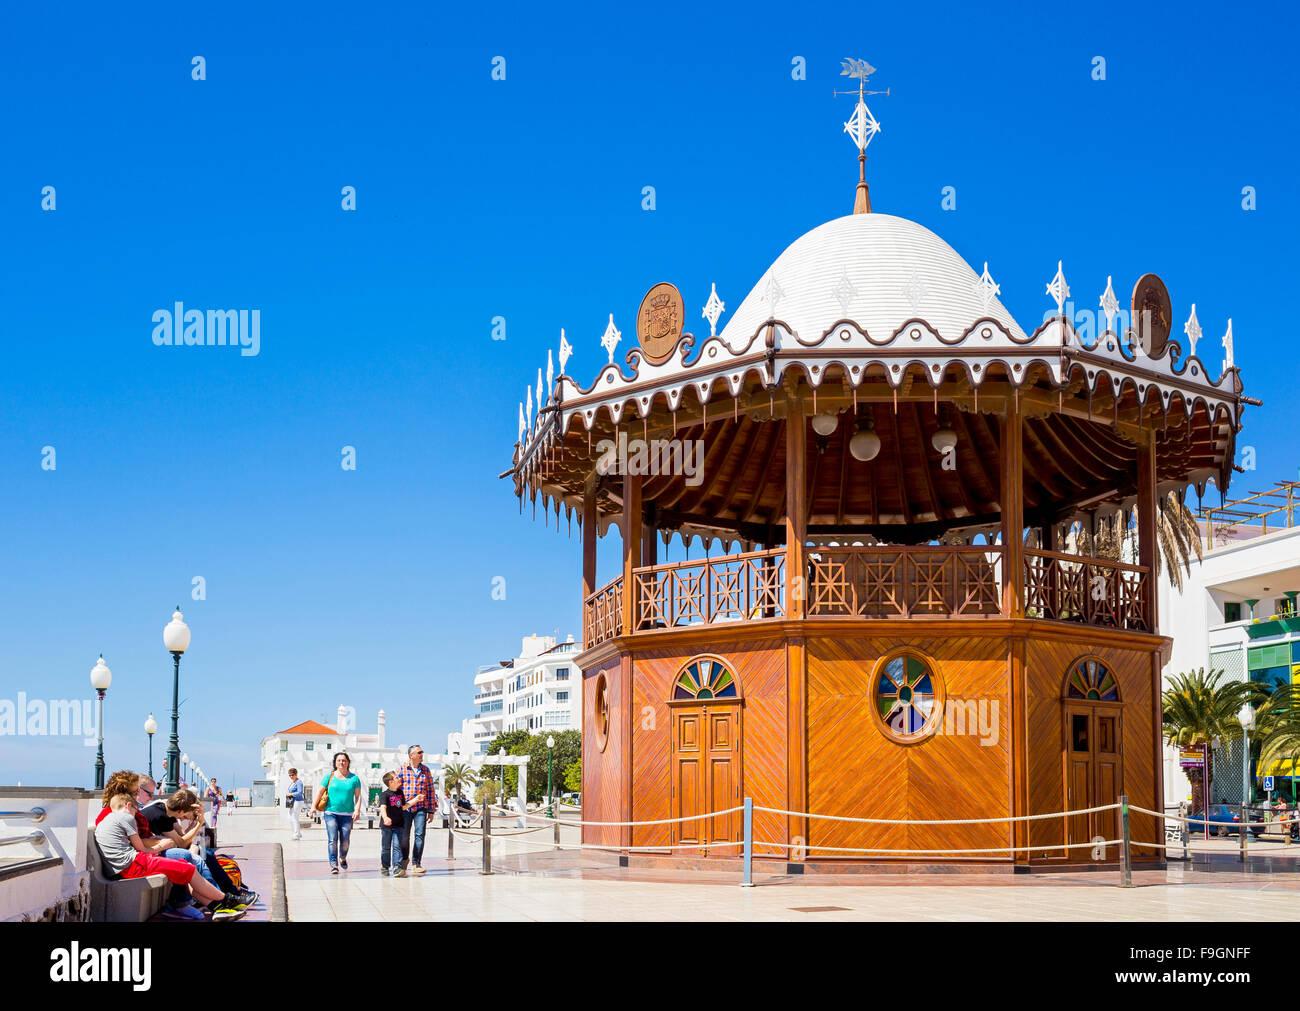 Pavilion, Parque Municipal, Arrecife, Lanzarote, Canary Islands, Spain - Stock Image